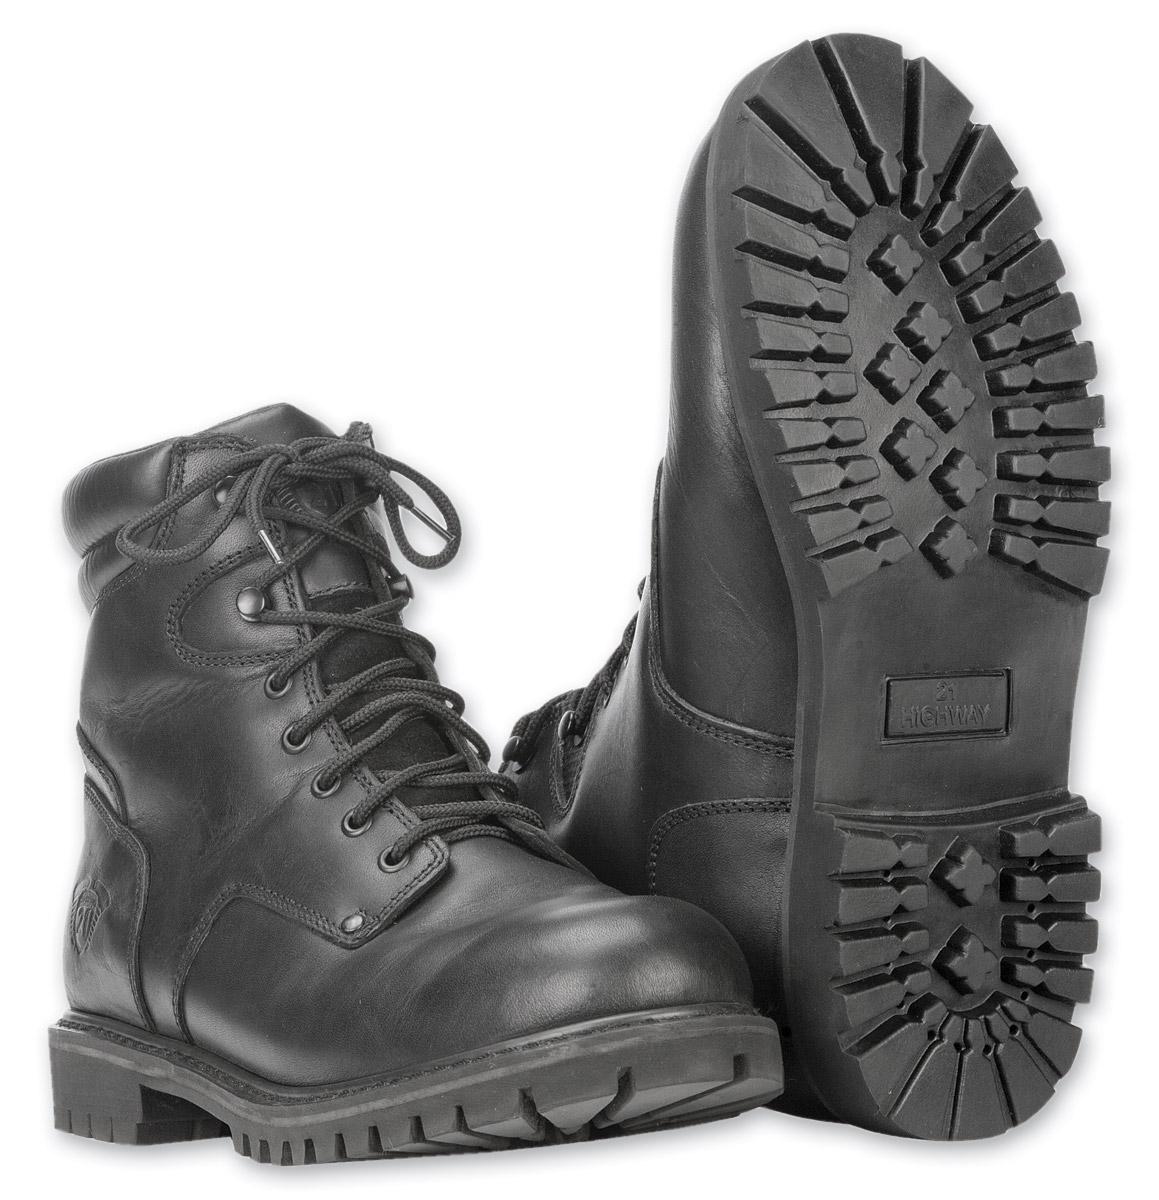 Highway 21 Men's RPM Lace-Up Black Boots